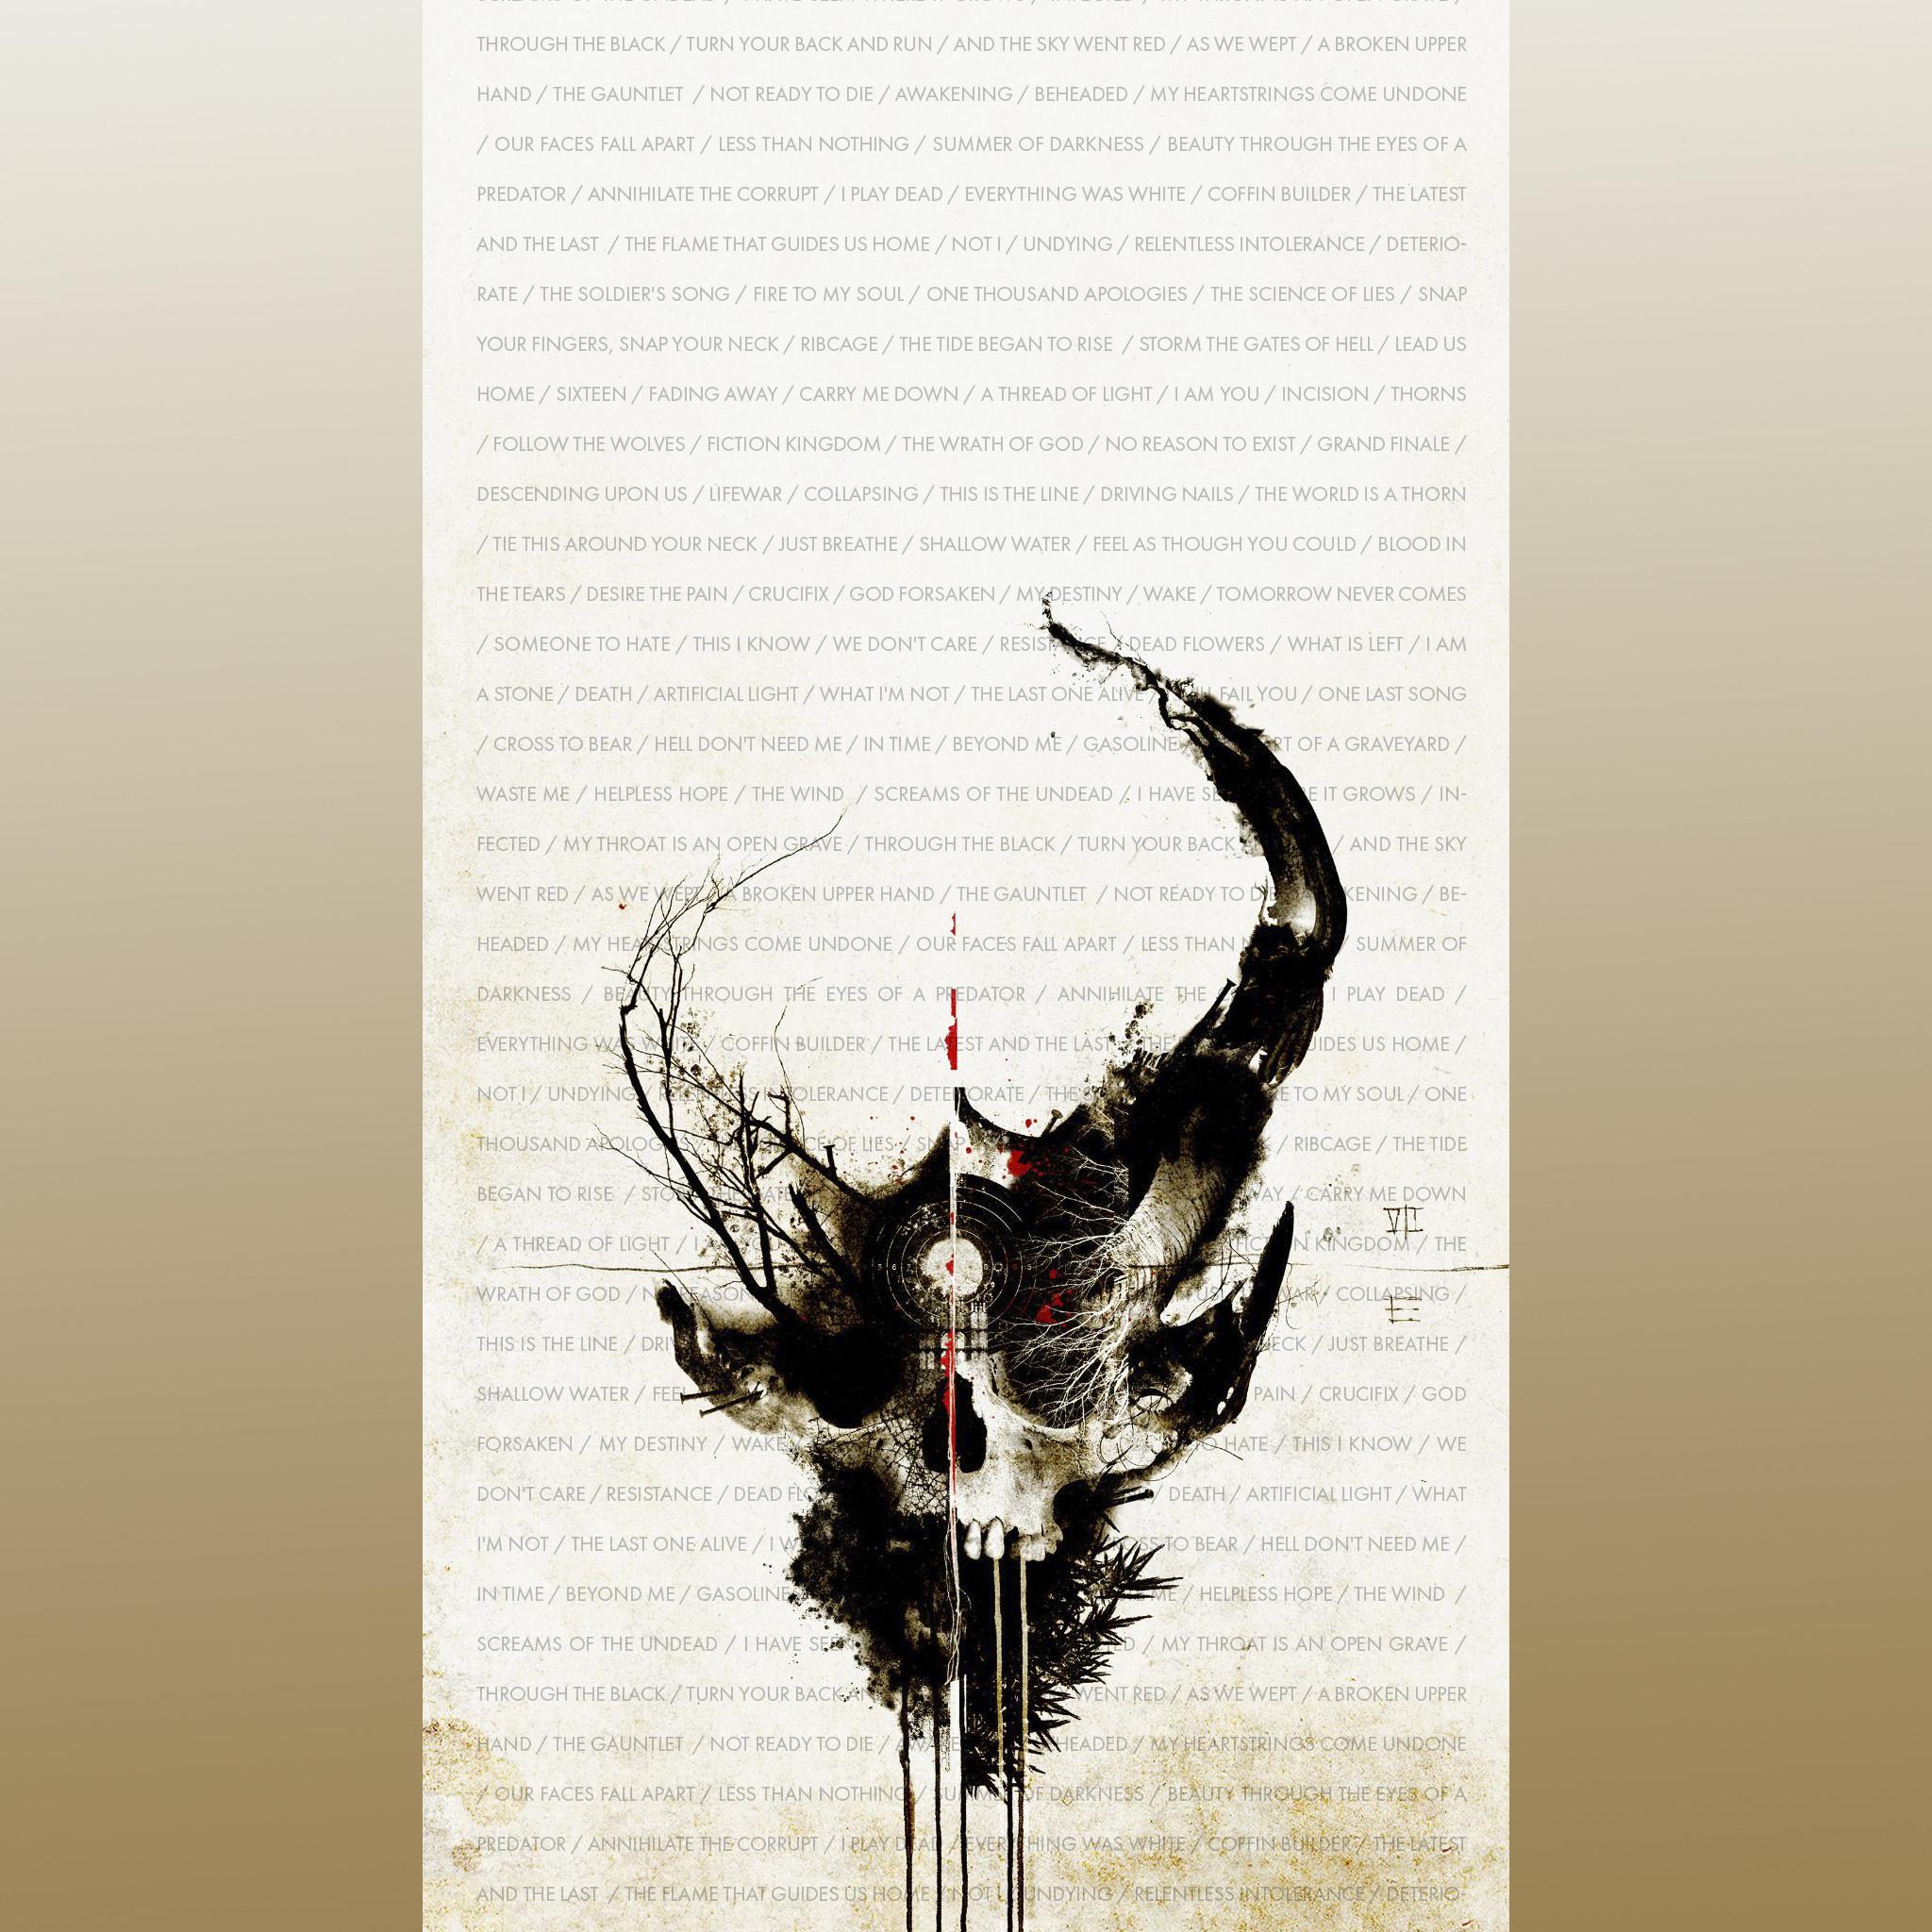 Diablo 3 Wallpaper 1920x1080: Demon Hunter Wallpaper (74+ Images